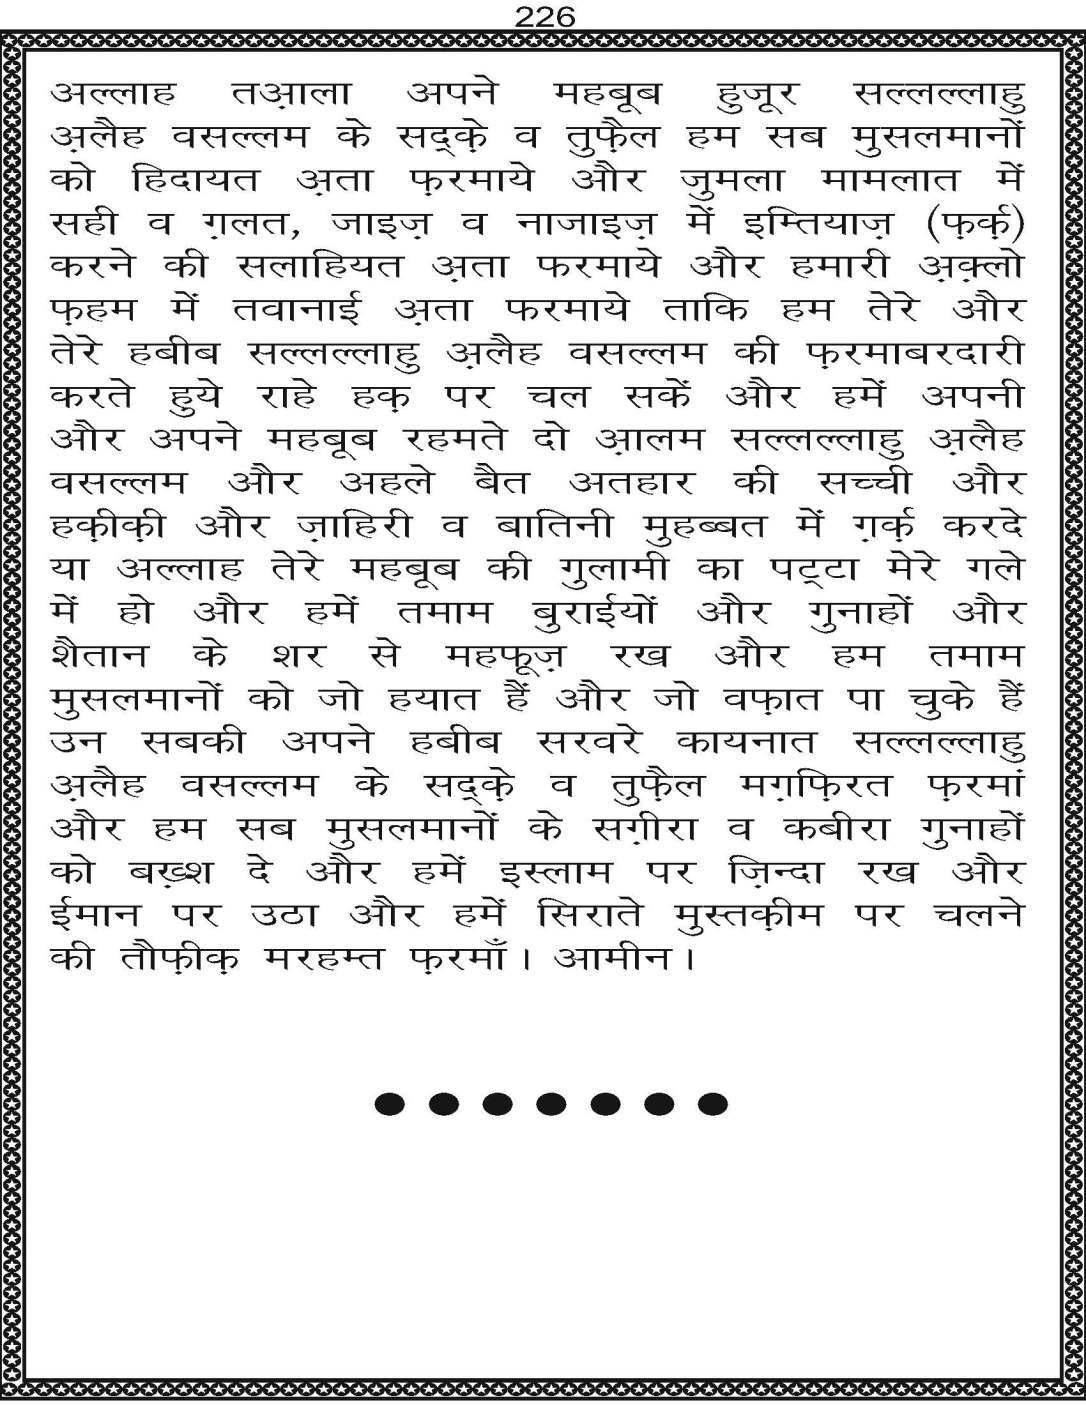 AzmateTaziyadari_Page_226